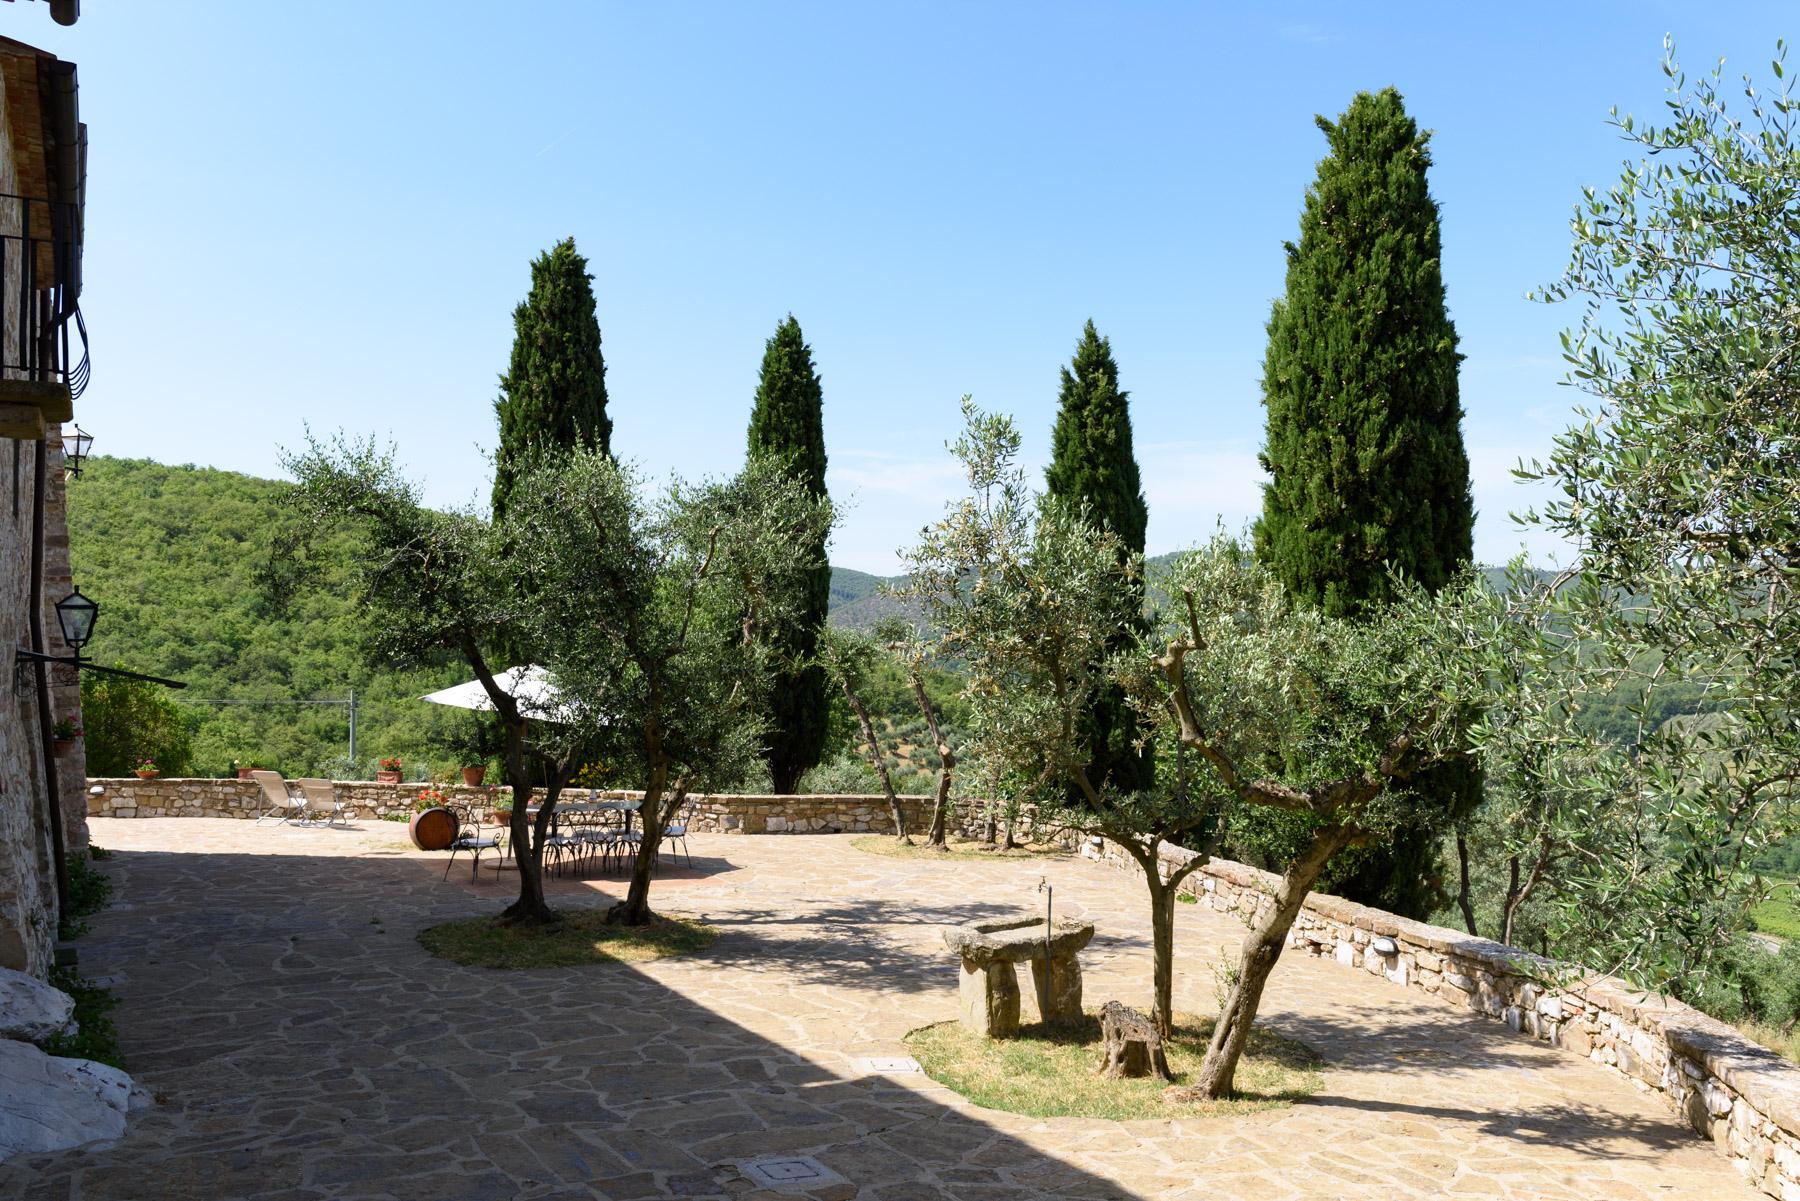 Rustico in Vendita a Castellina In Chianti: 5 locali, 650 mq - Foto 9